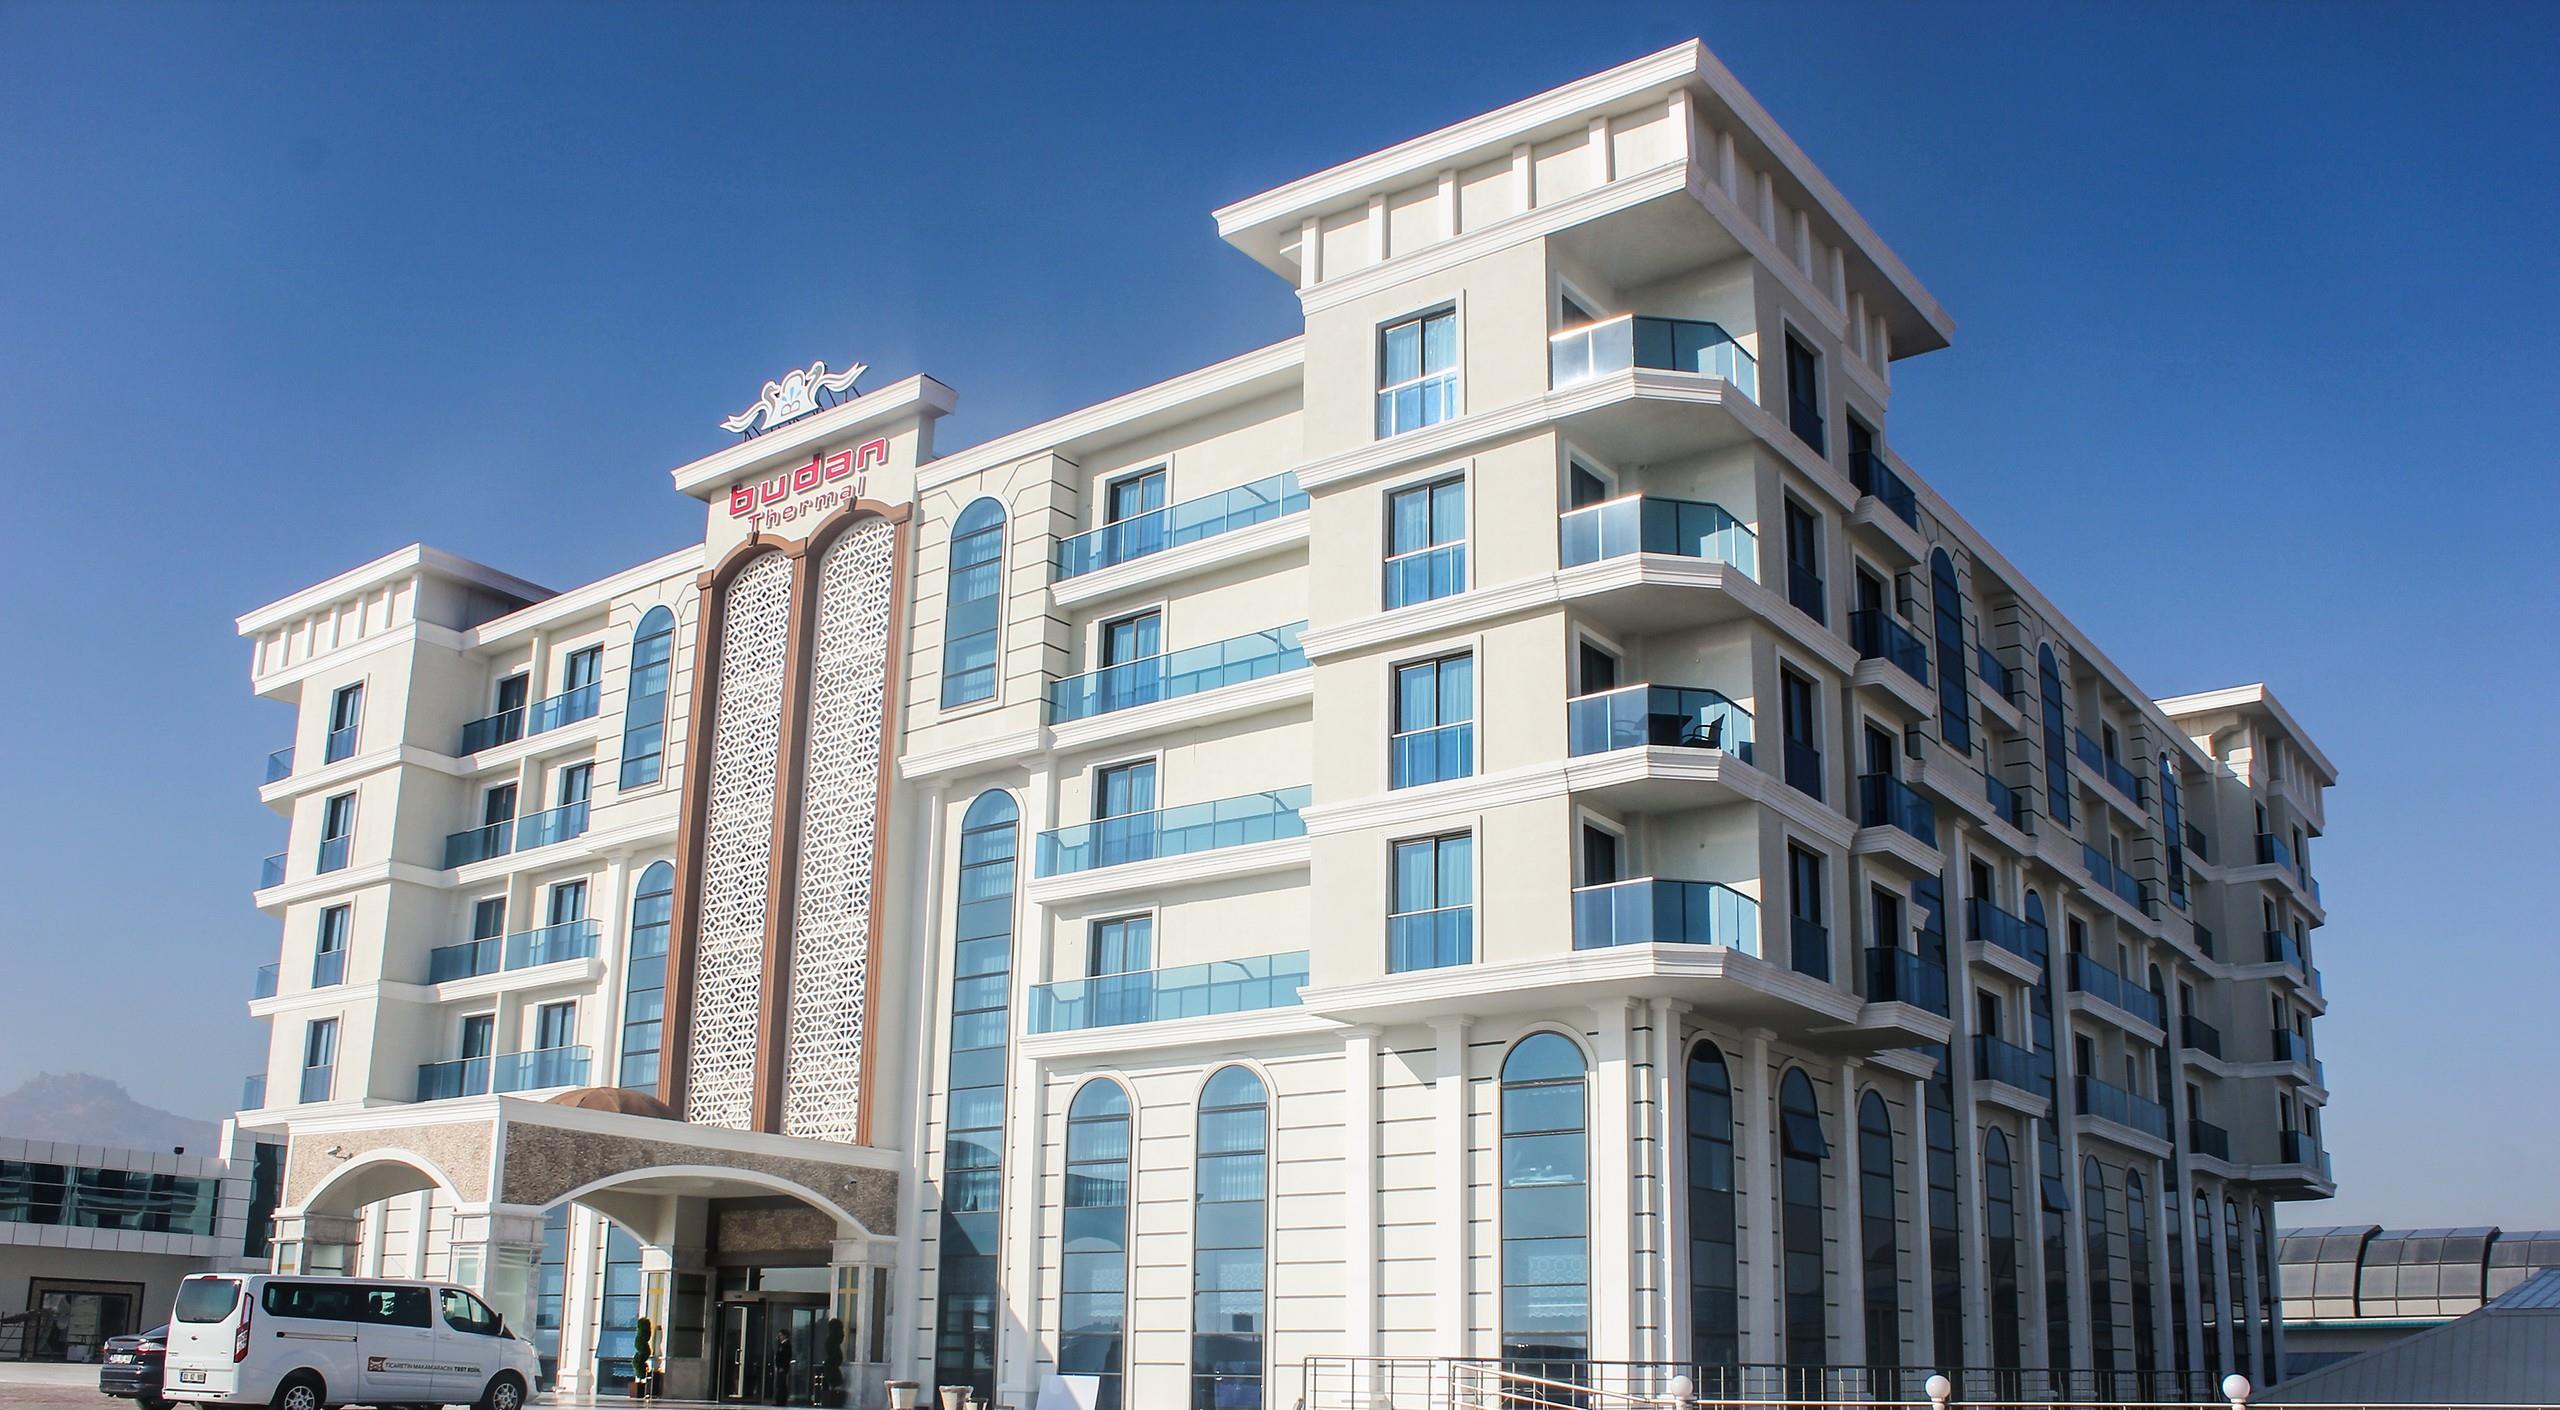 Budan Thermal Spa Hotel & Convention Cen203965